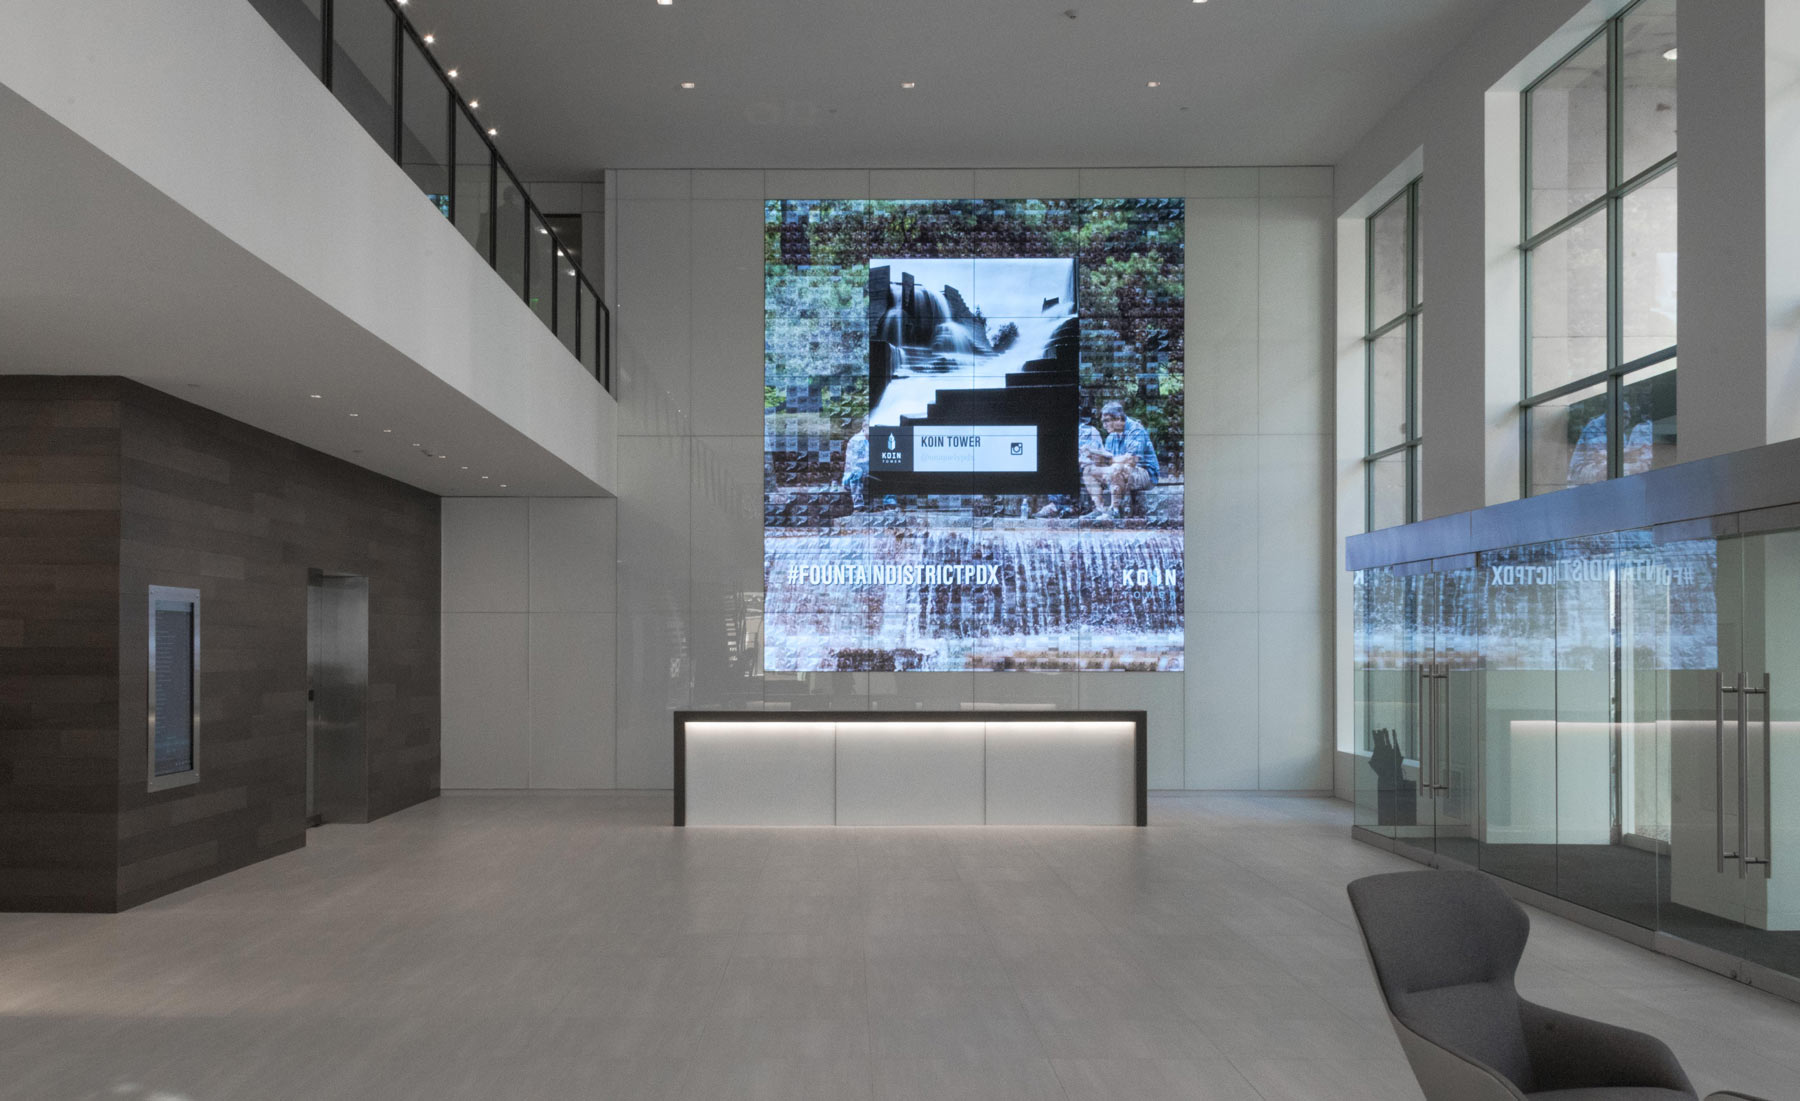 koin-media-wall-lobby.jpg